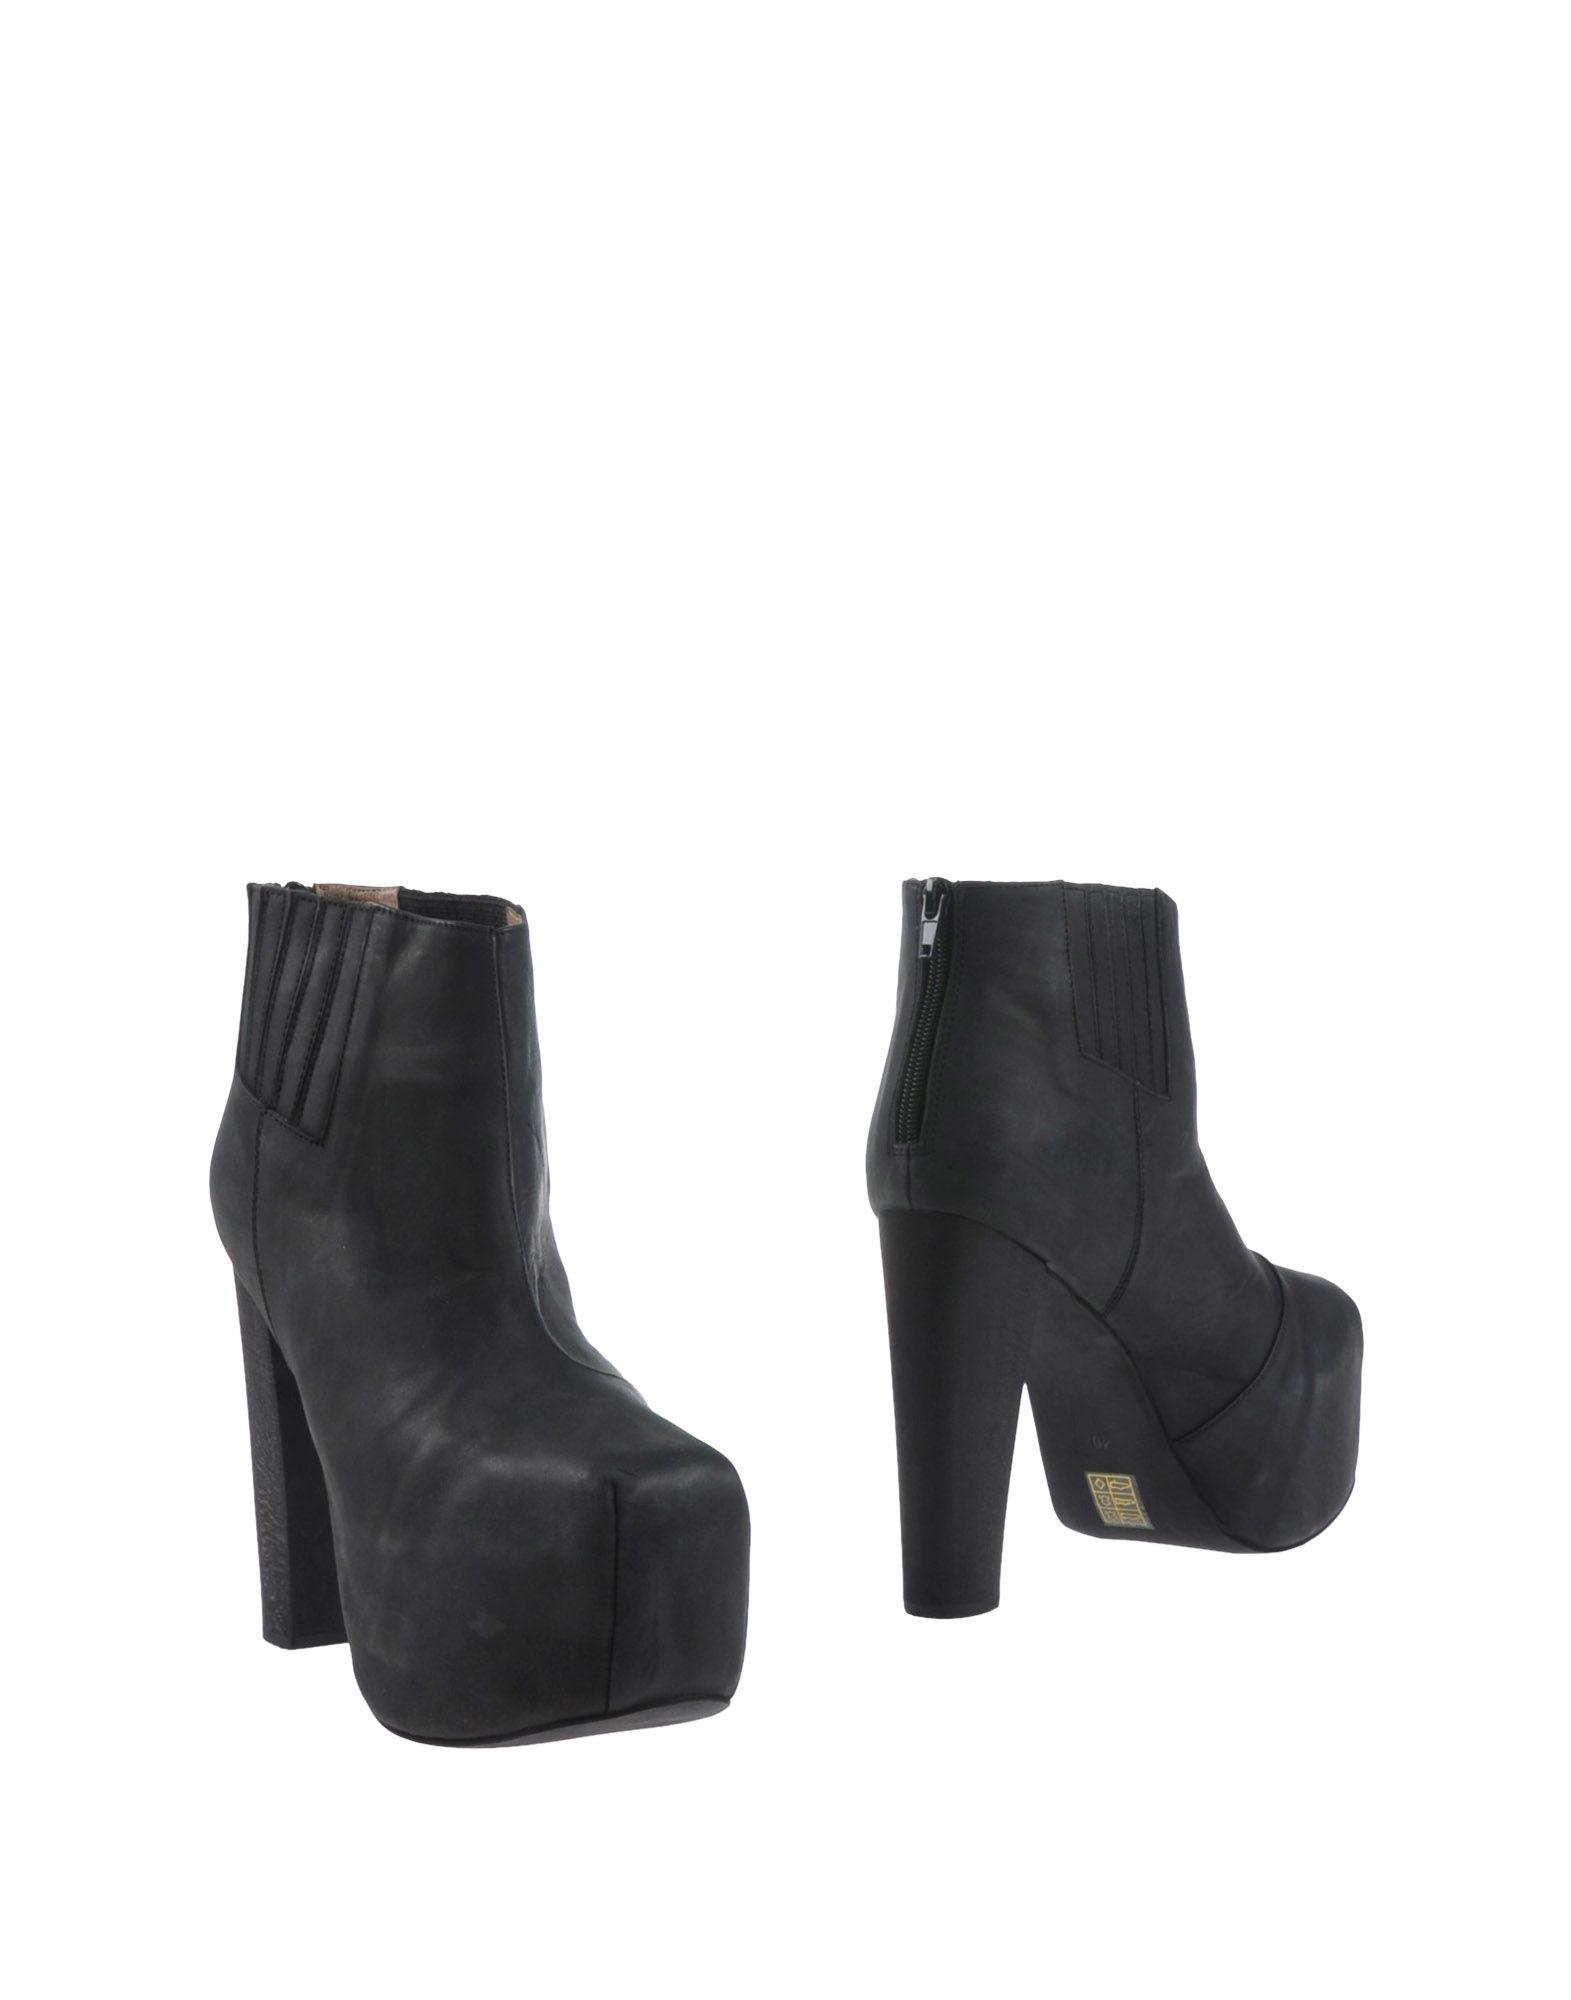 Jeffrey Campbell Stiefelette Gute Damen  11035980SA Gute Stiefelette Qualität beliebte Schuhe 8c9e4f